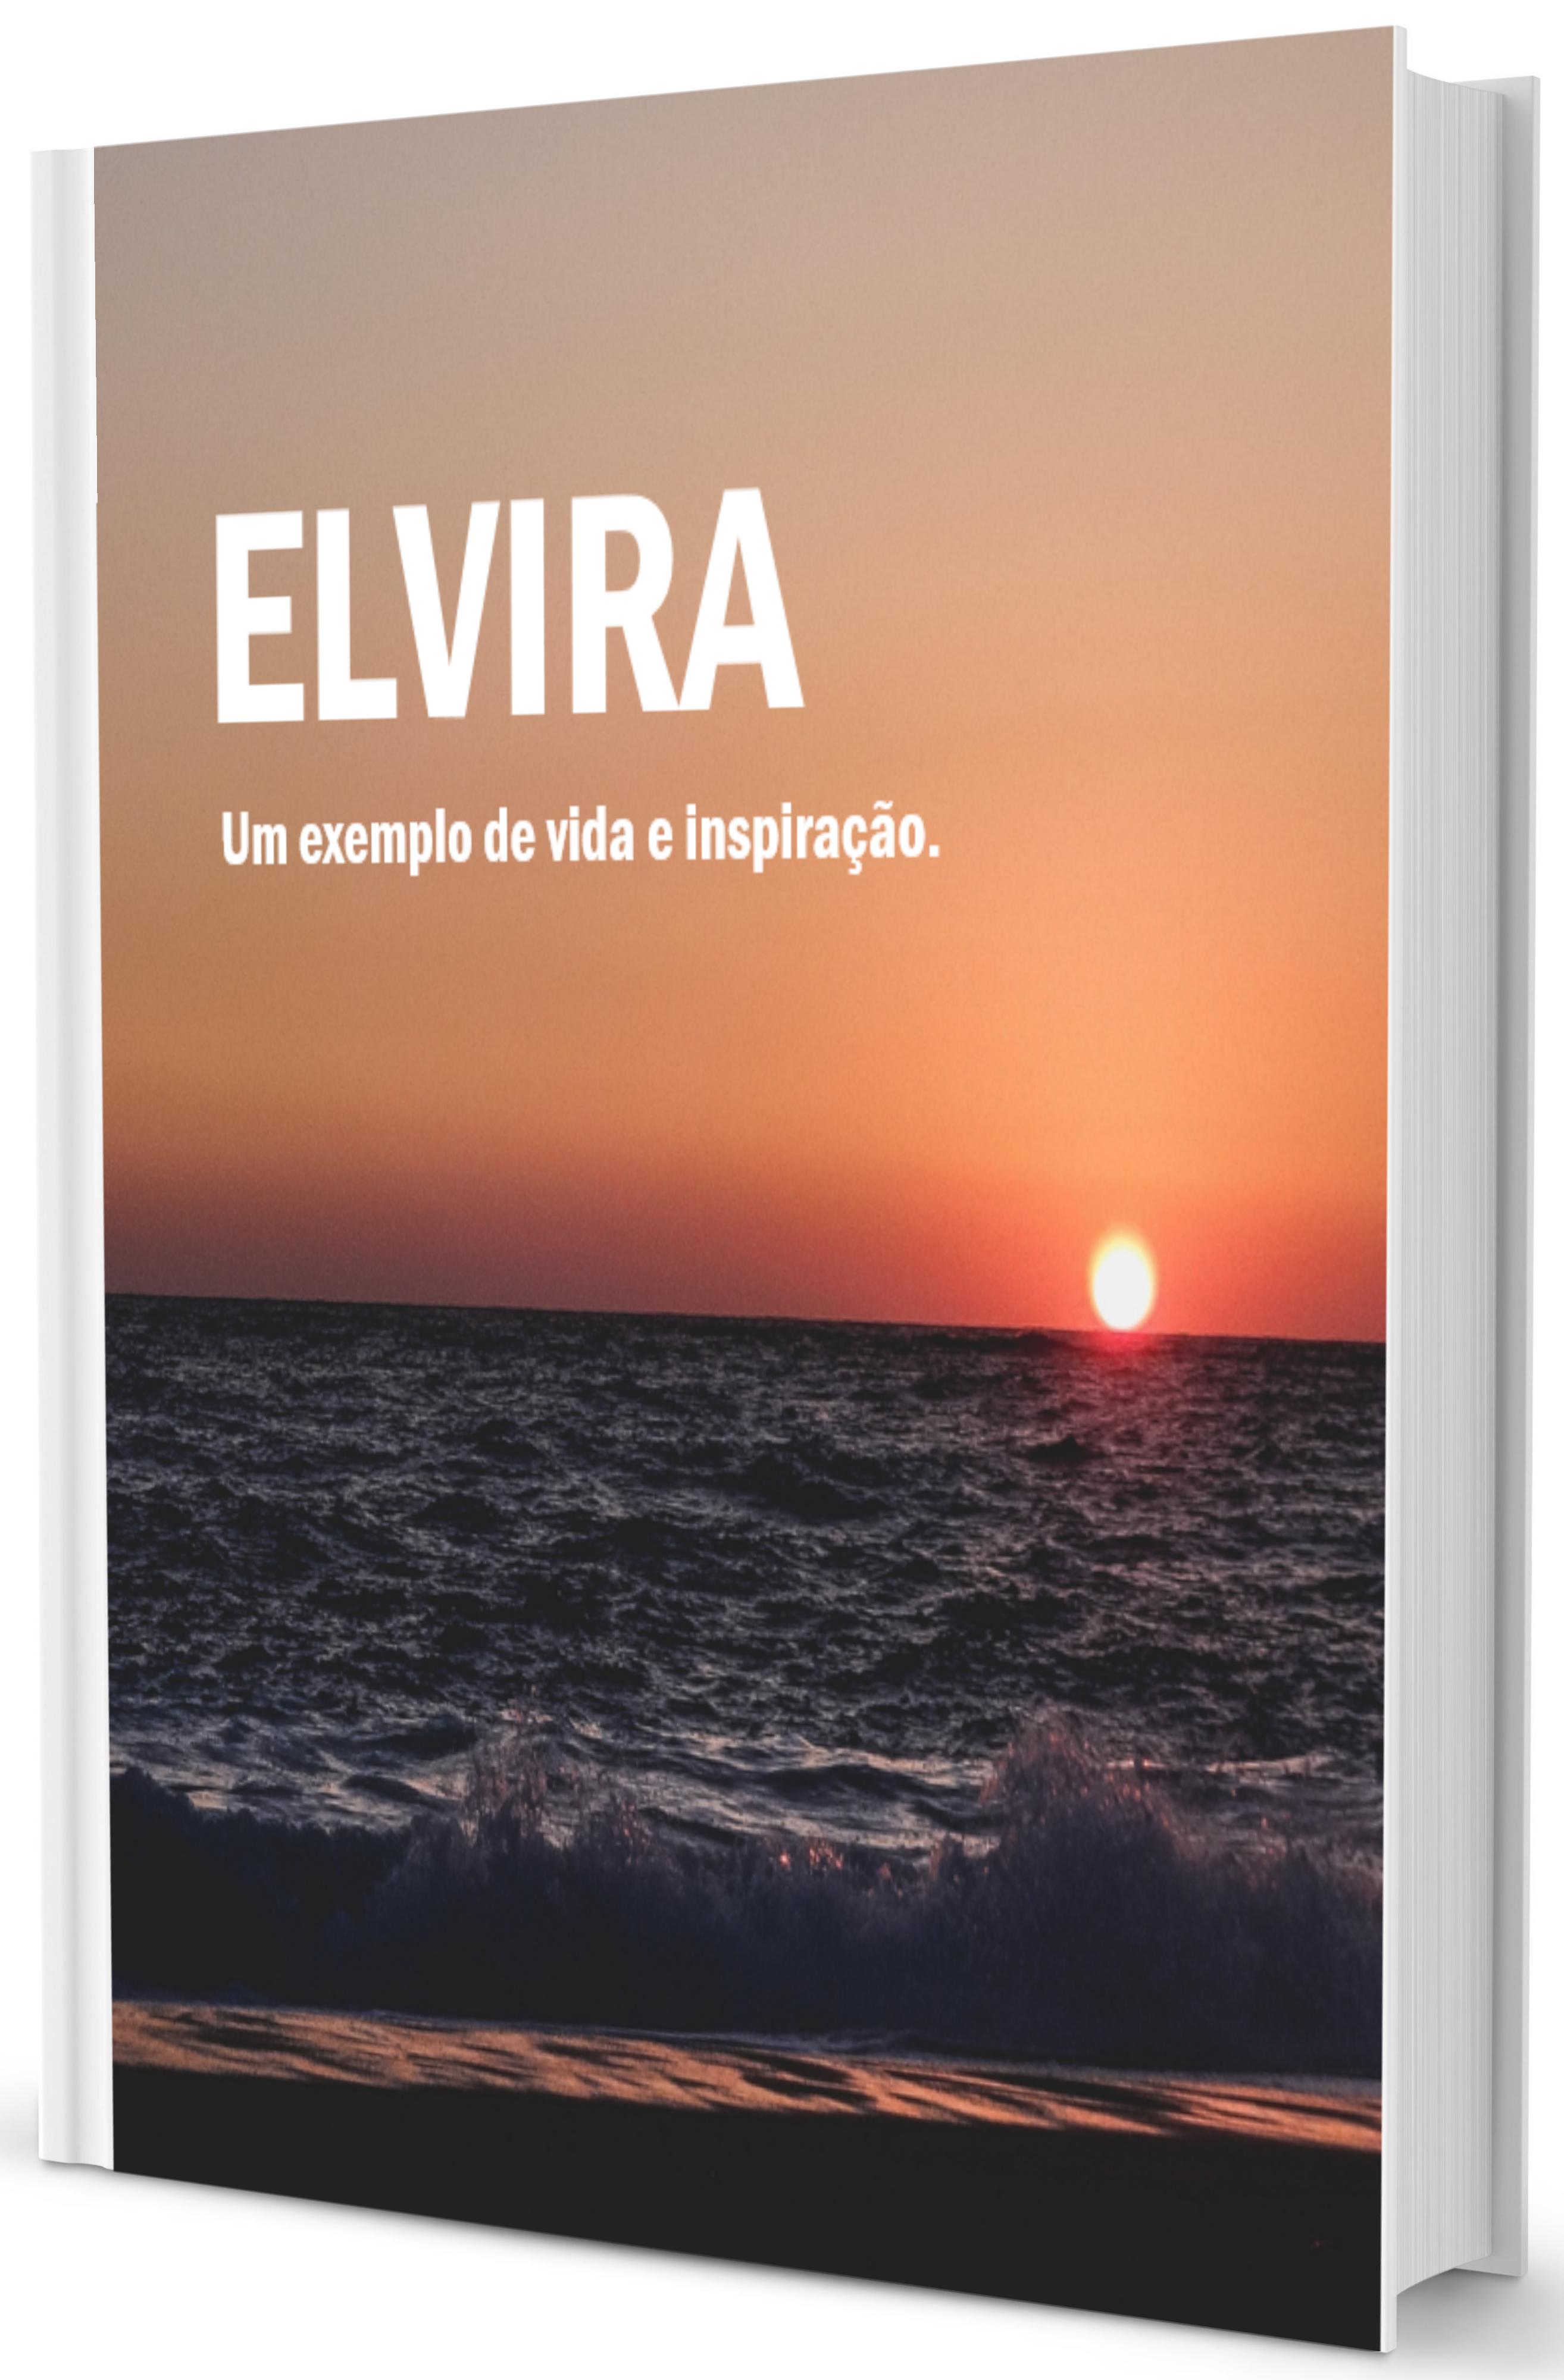 Livro Elvira Digital